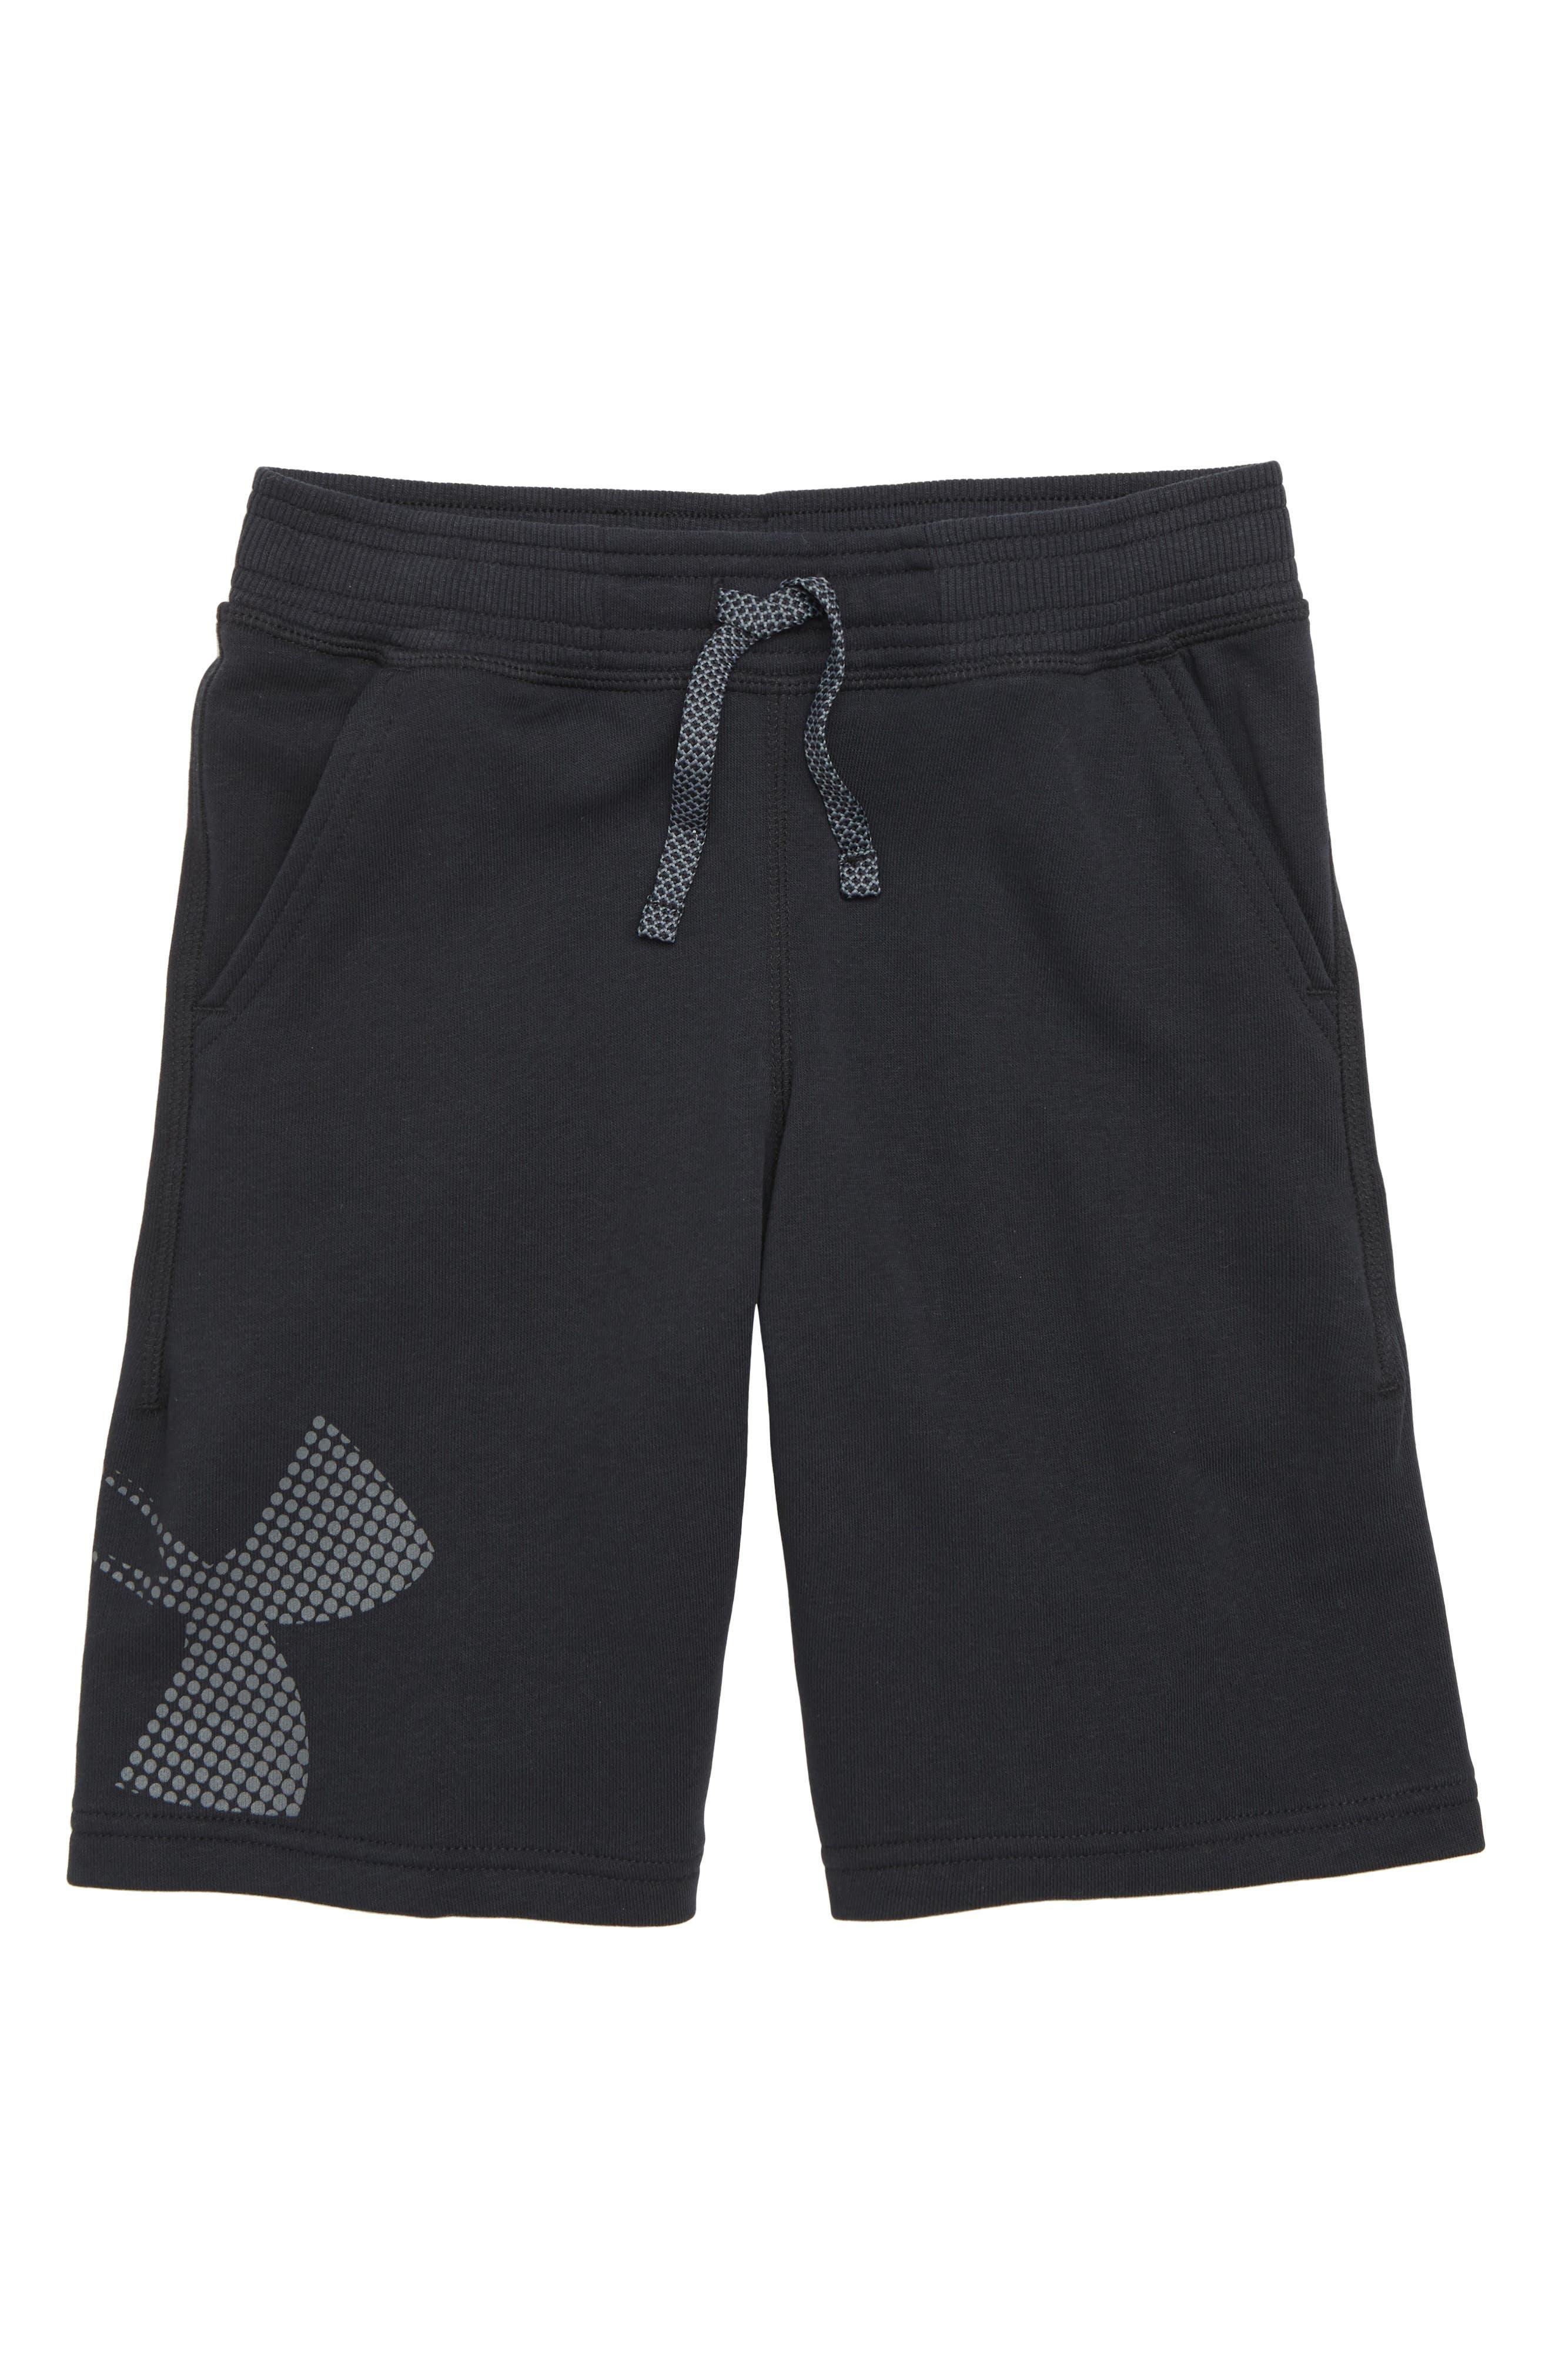 Graphic Knit Shorts,                         Main,                         color, 001